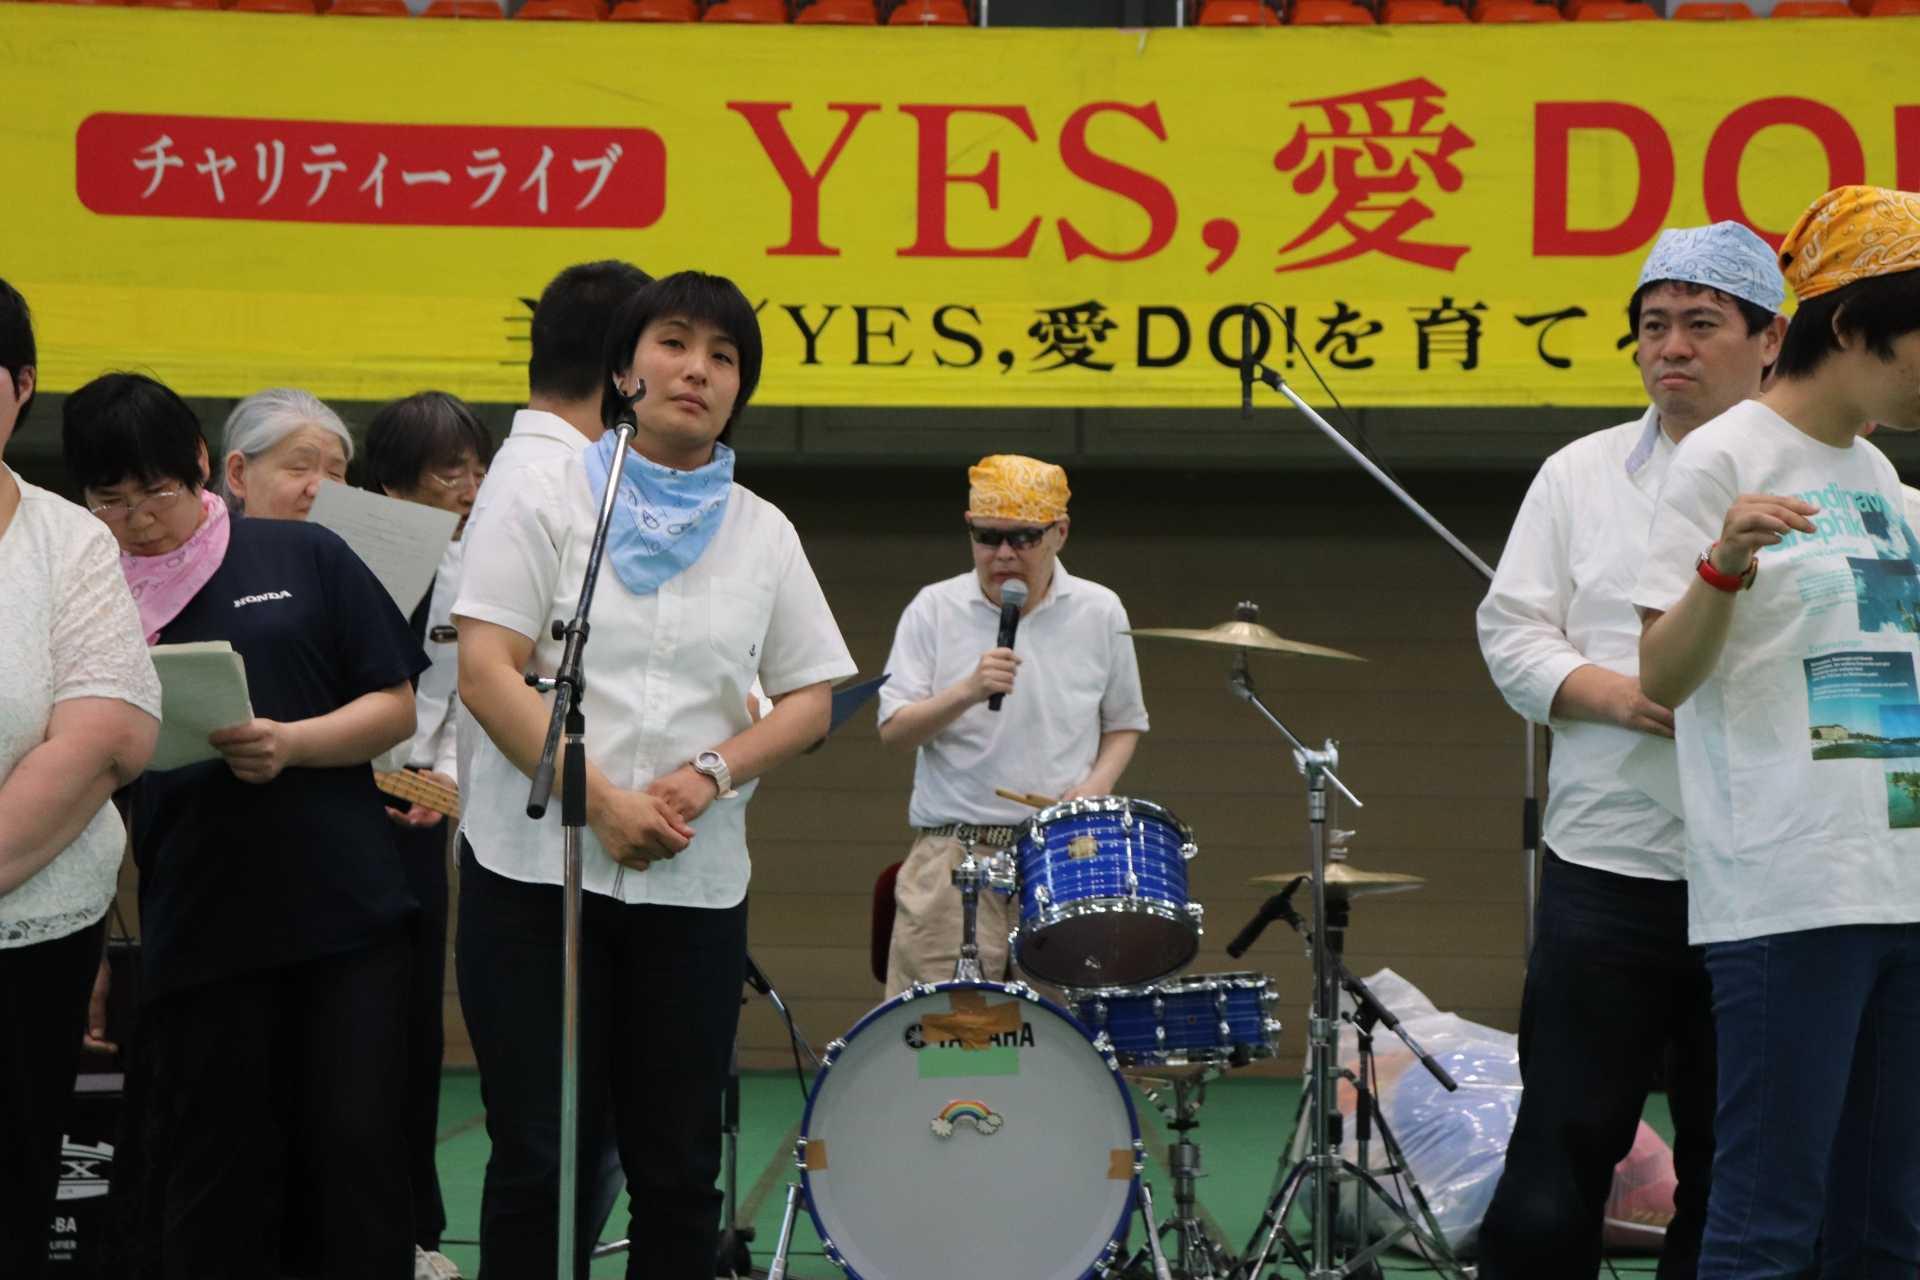 第25回YES,愛DO!音楽祭youtubeで配信!